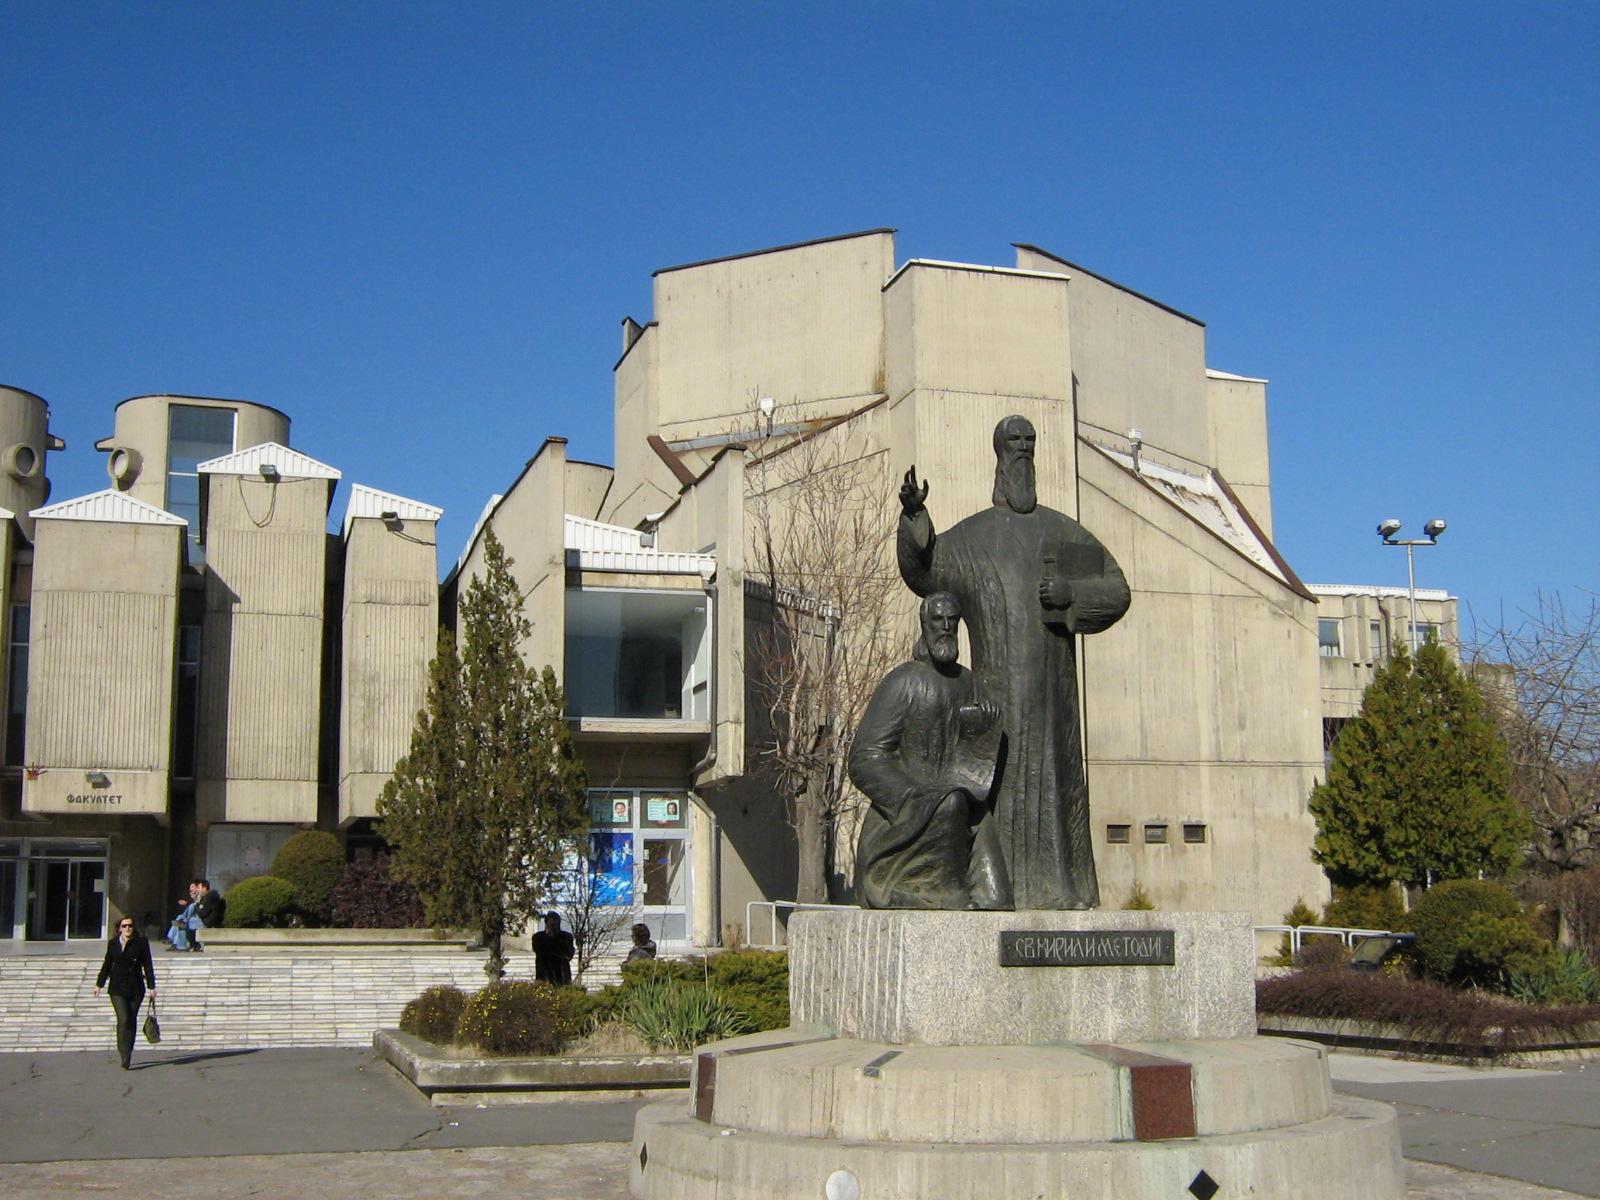 Ss_Cyril_and_Methodius_University_campus_Skopje.jpg